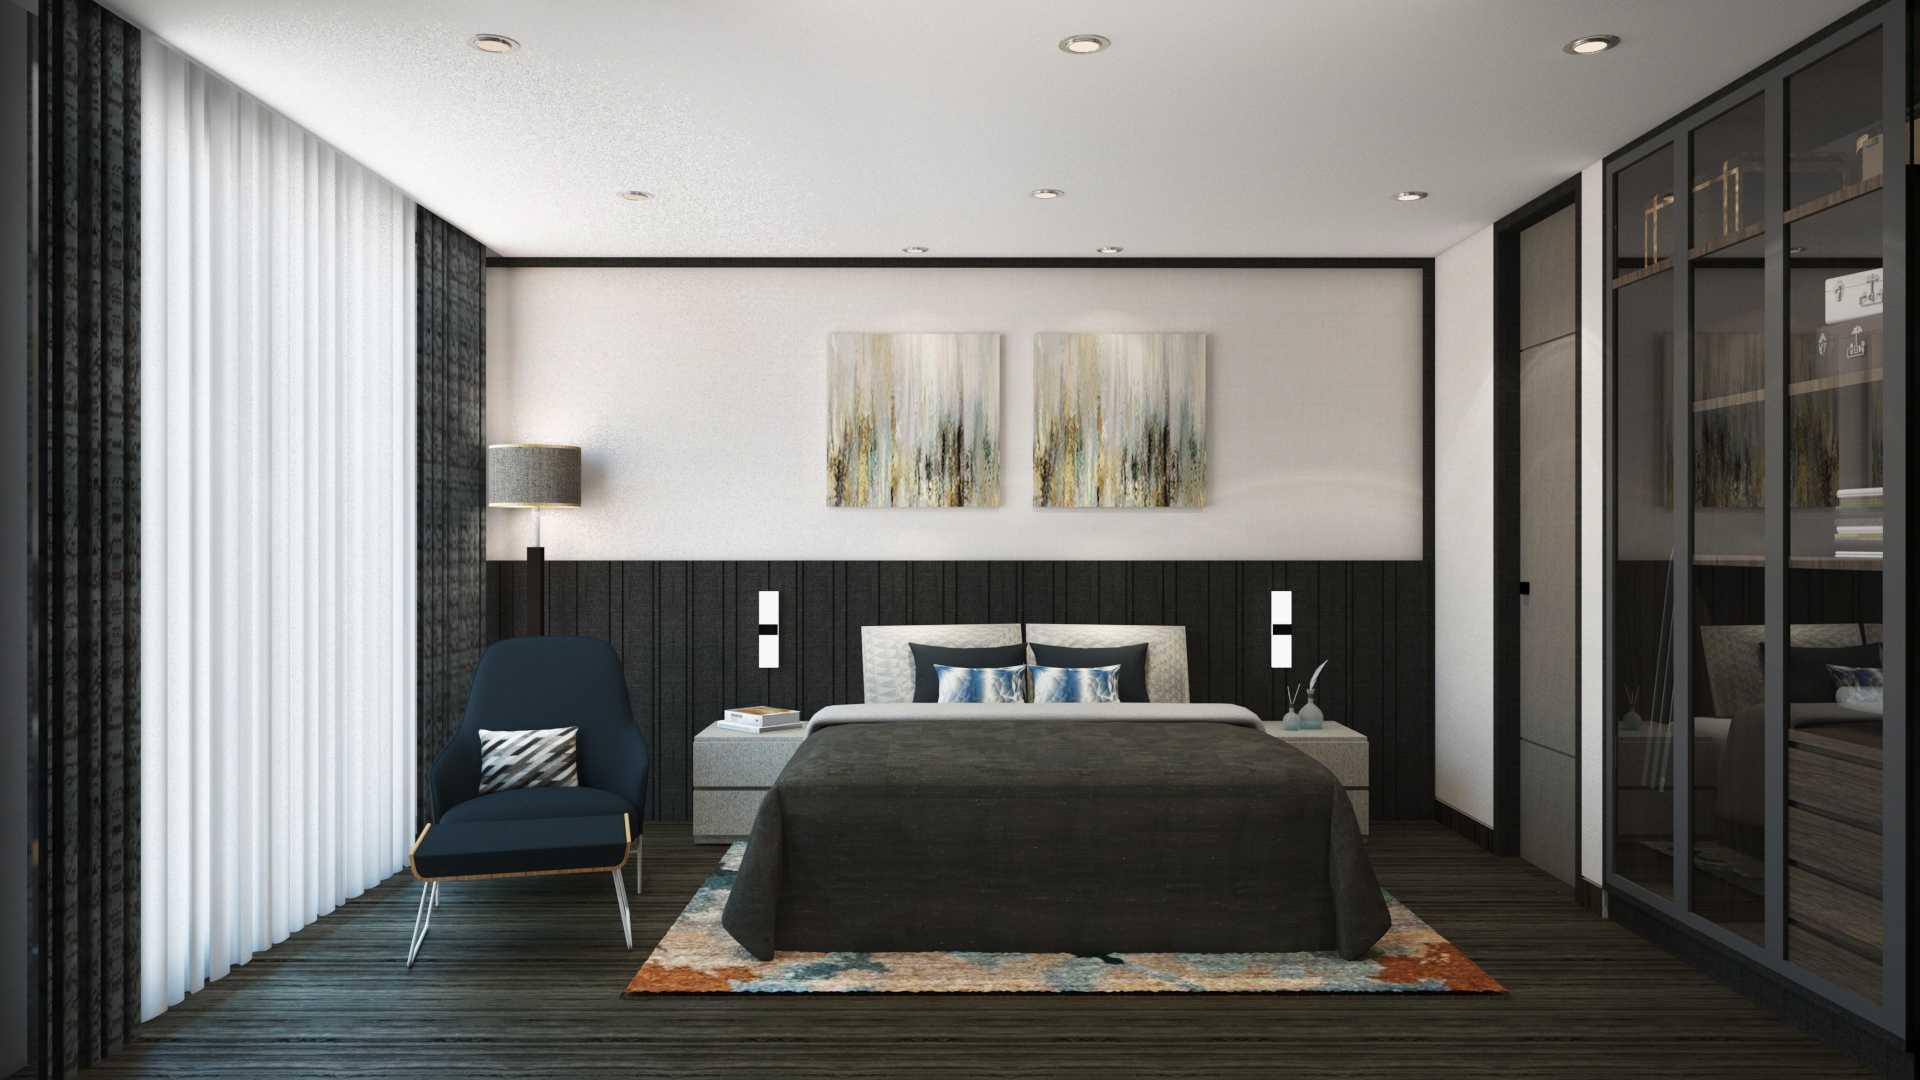 Oka Leonardy Interior Design Concept : Apartemen 2 Br - Jakarta Cikarang, Bekasi, Jawa Barat, Indonesia Cikarang, Bekasi, Jawa Barat, Indonesia Oka-Leonardy-Interior-Design-Concept-Apartemen-2-Br-Jakarta   110533